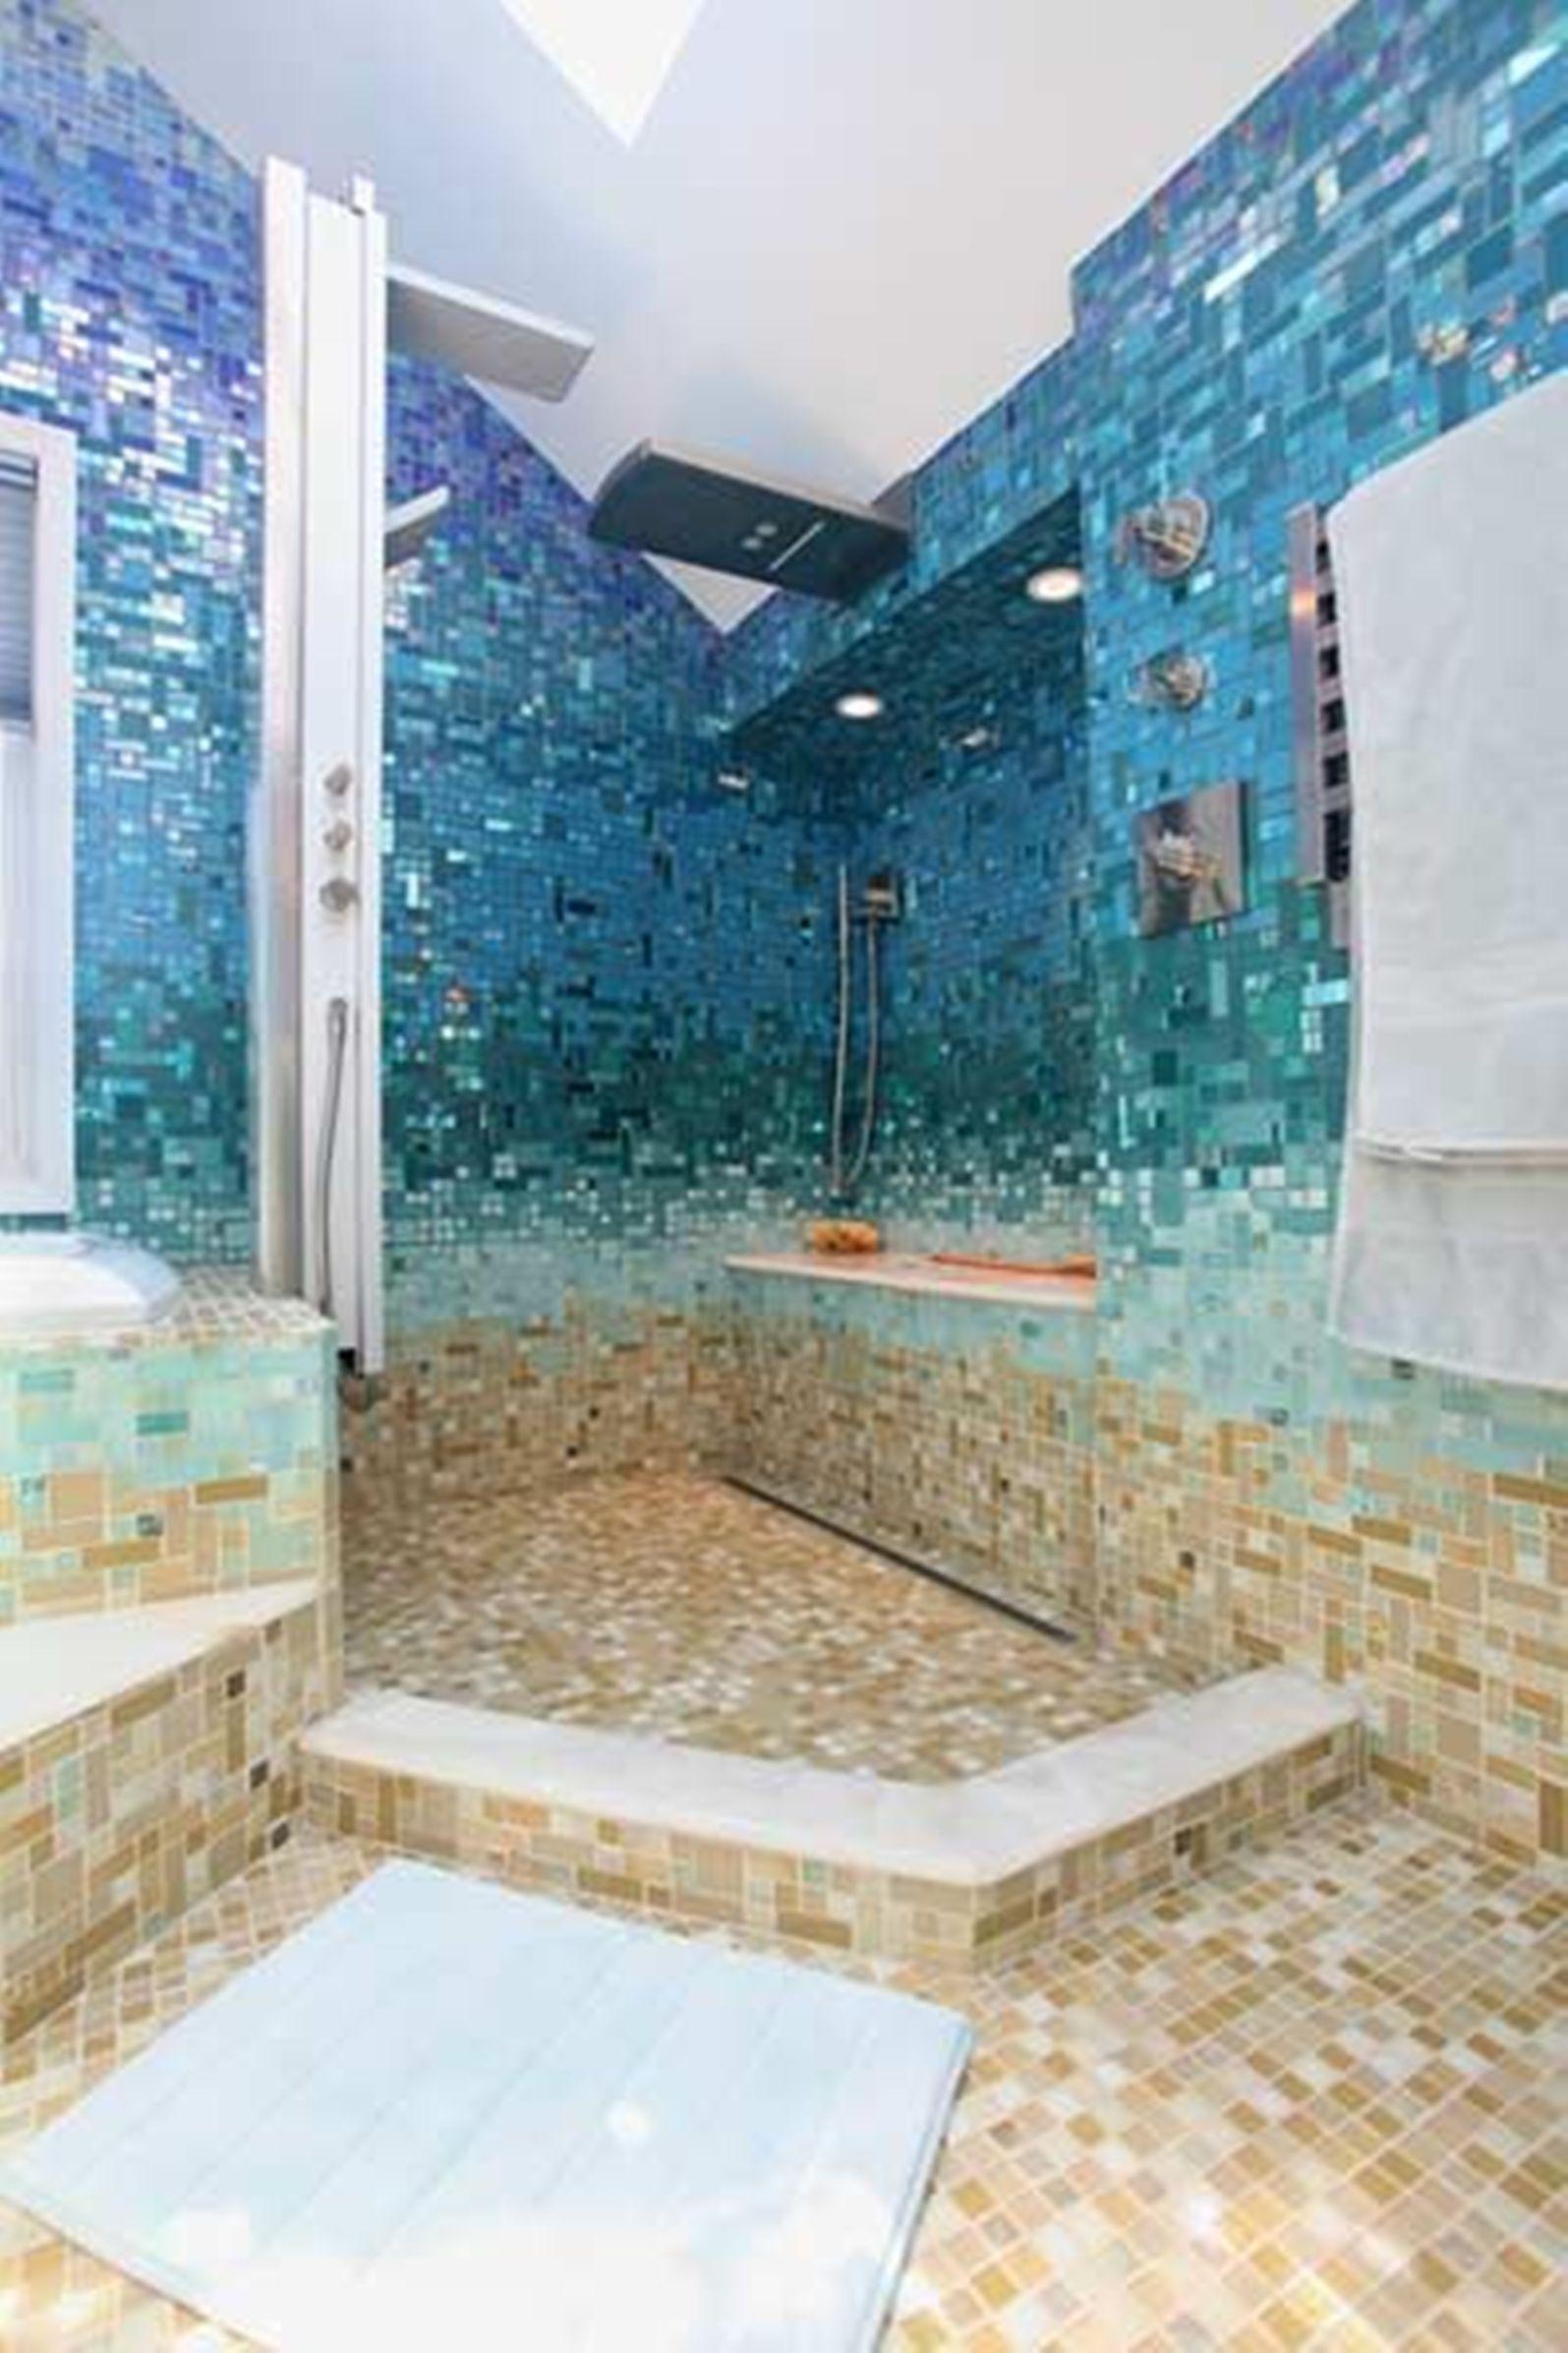 http://www.soungwiser.com/bathroom-tile-ideas-for-walls/amazing ...